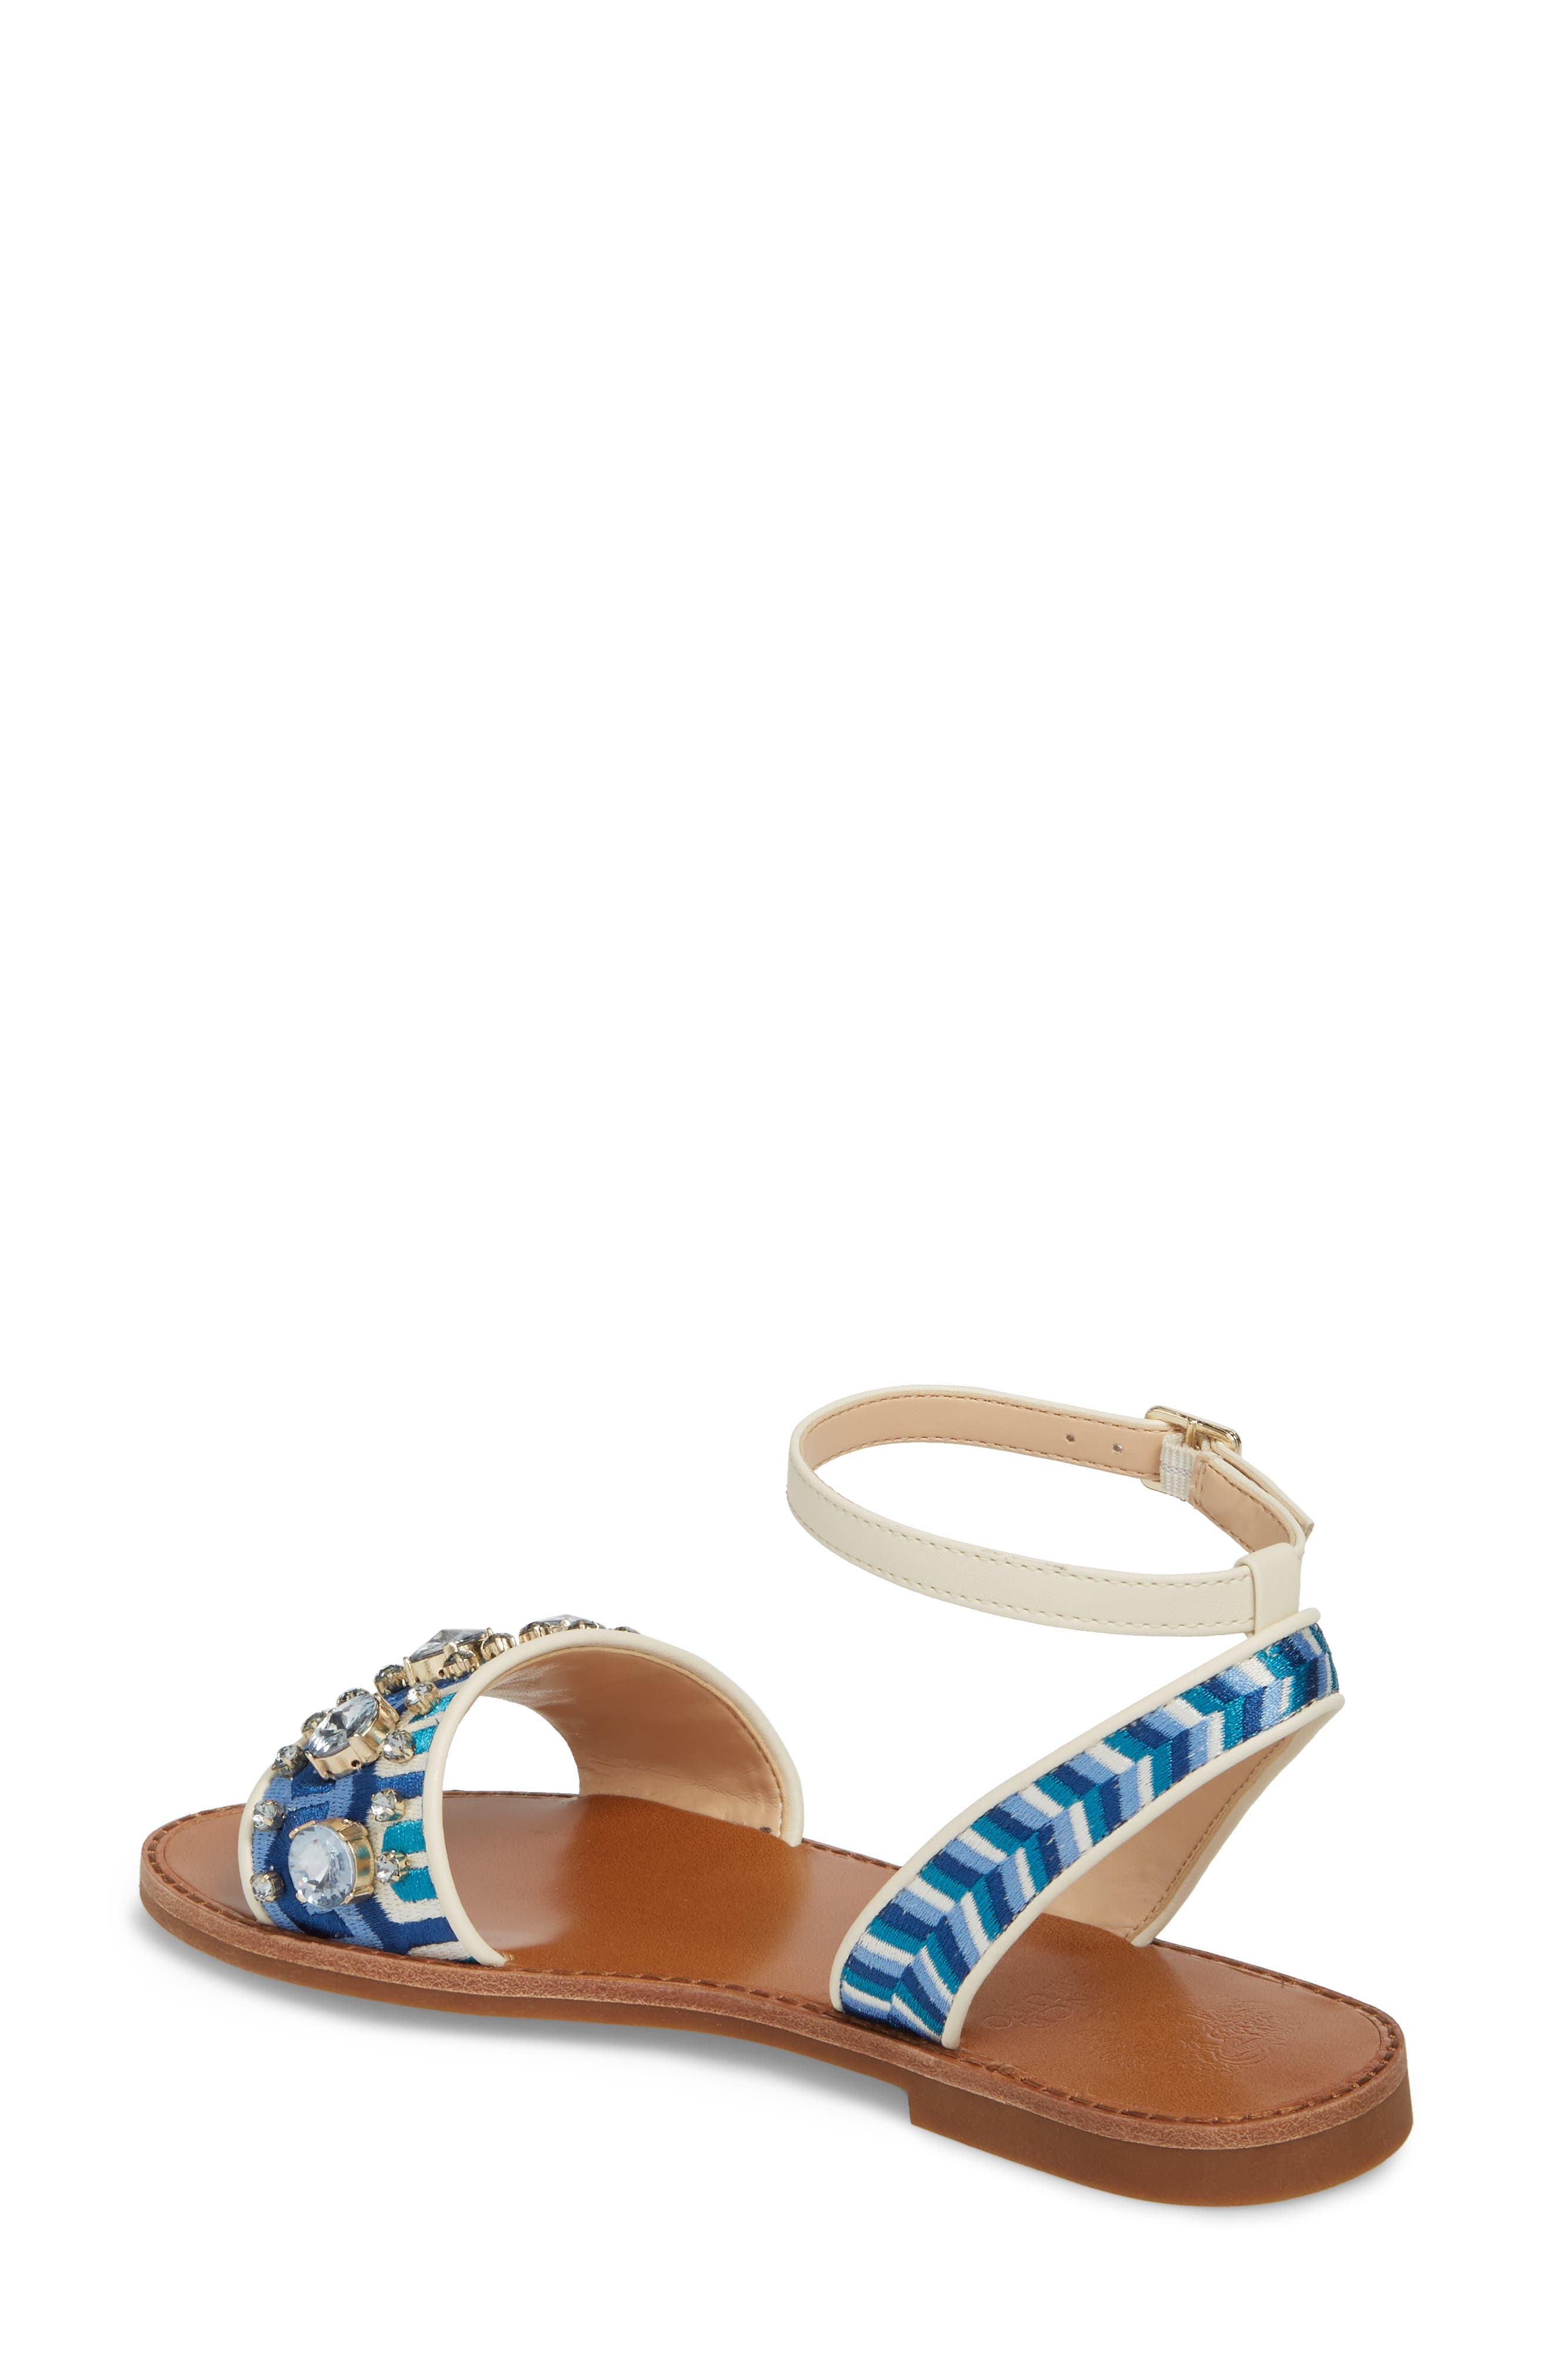 Akitta Sandal,                             Alternate thumbnail 2, color,                             Blue Multi/ Vanilla Fabric